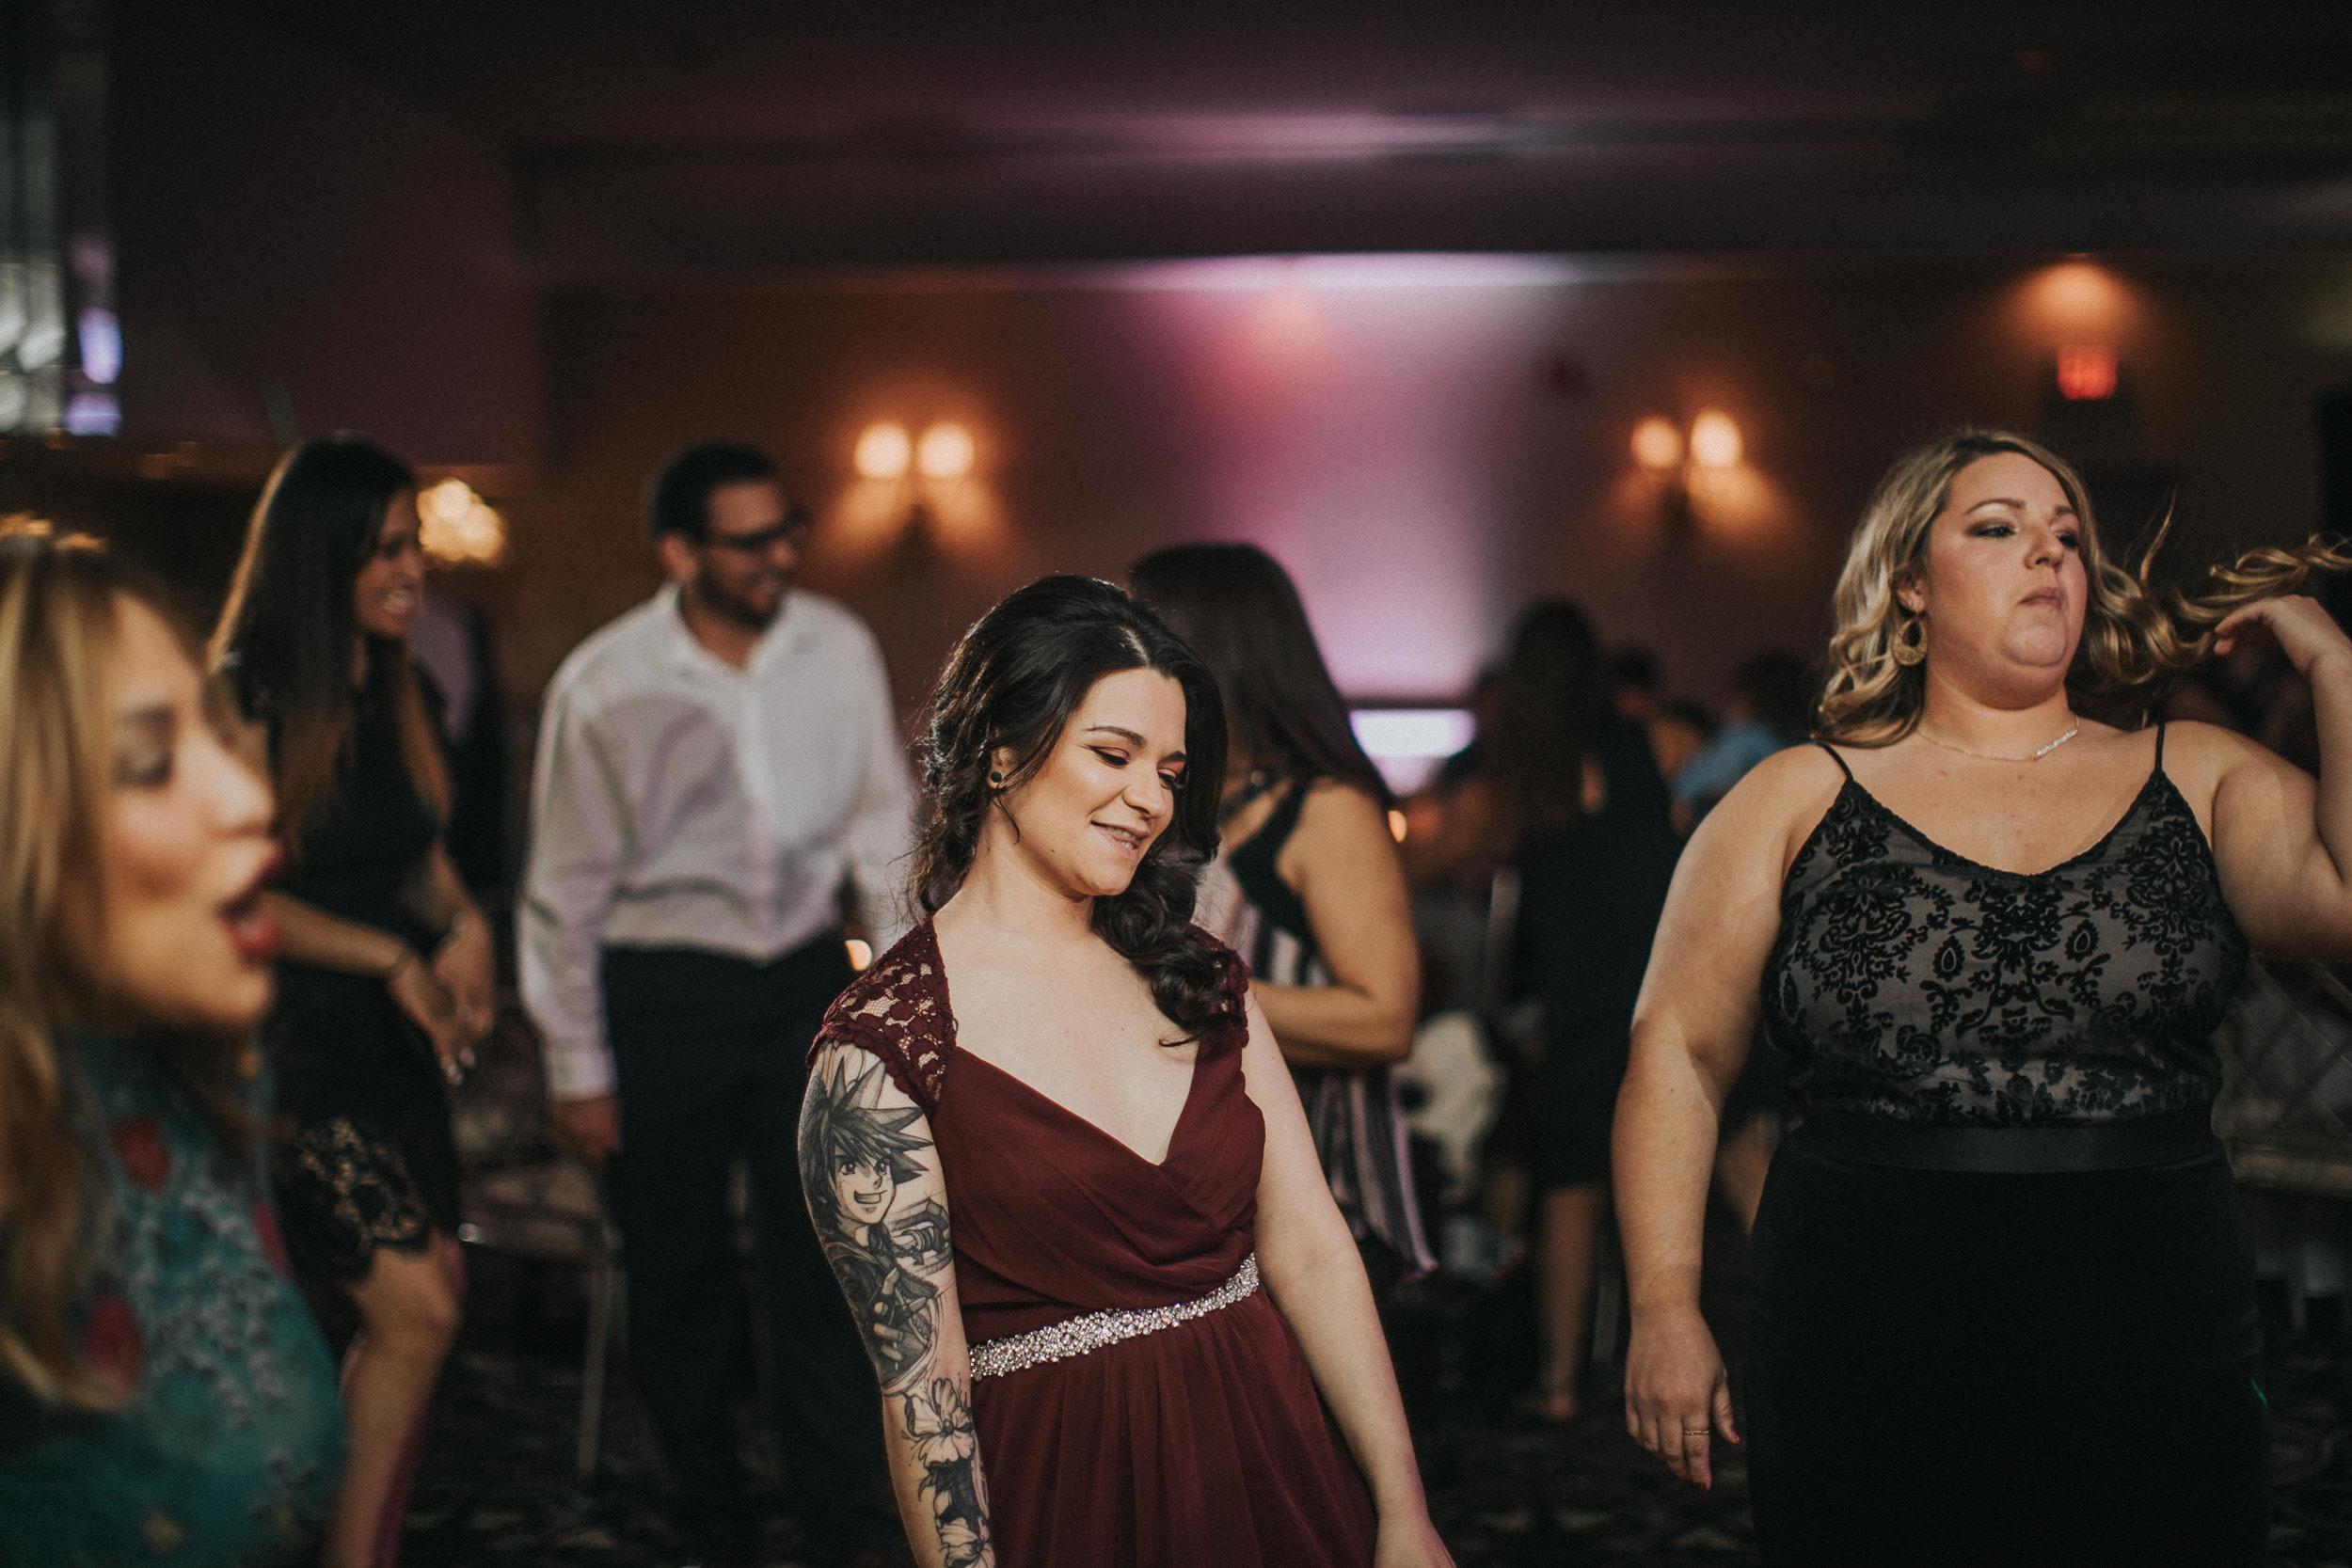 New-Jersey-Wedding-Photographer-ReceptionCenter-Valeria&Mike-Reception (130 of 265).jpg